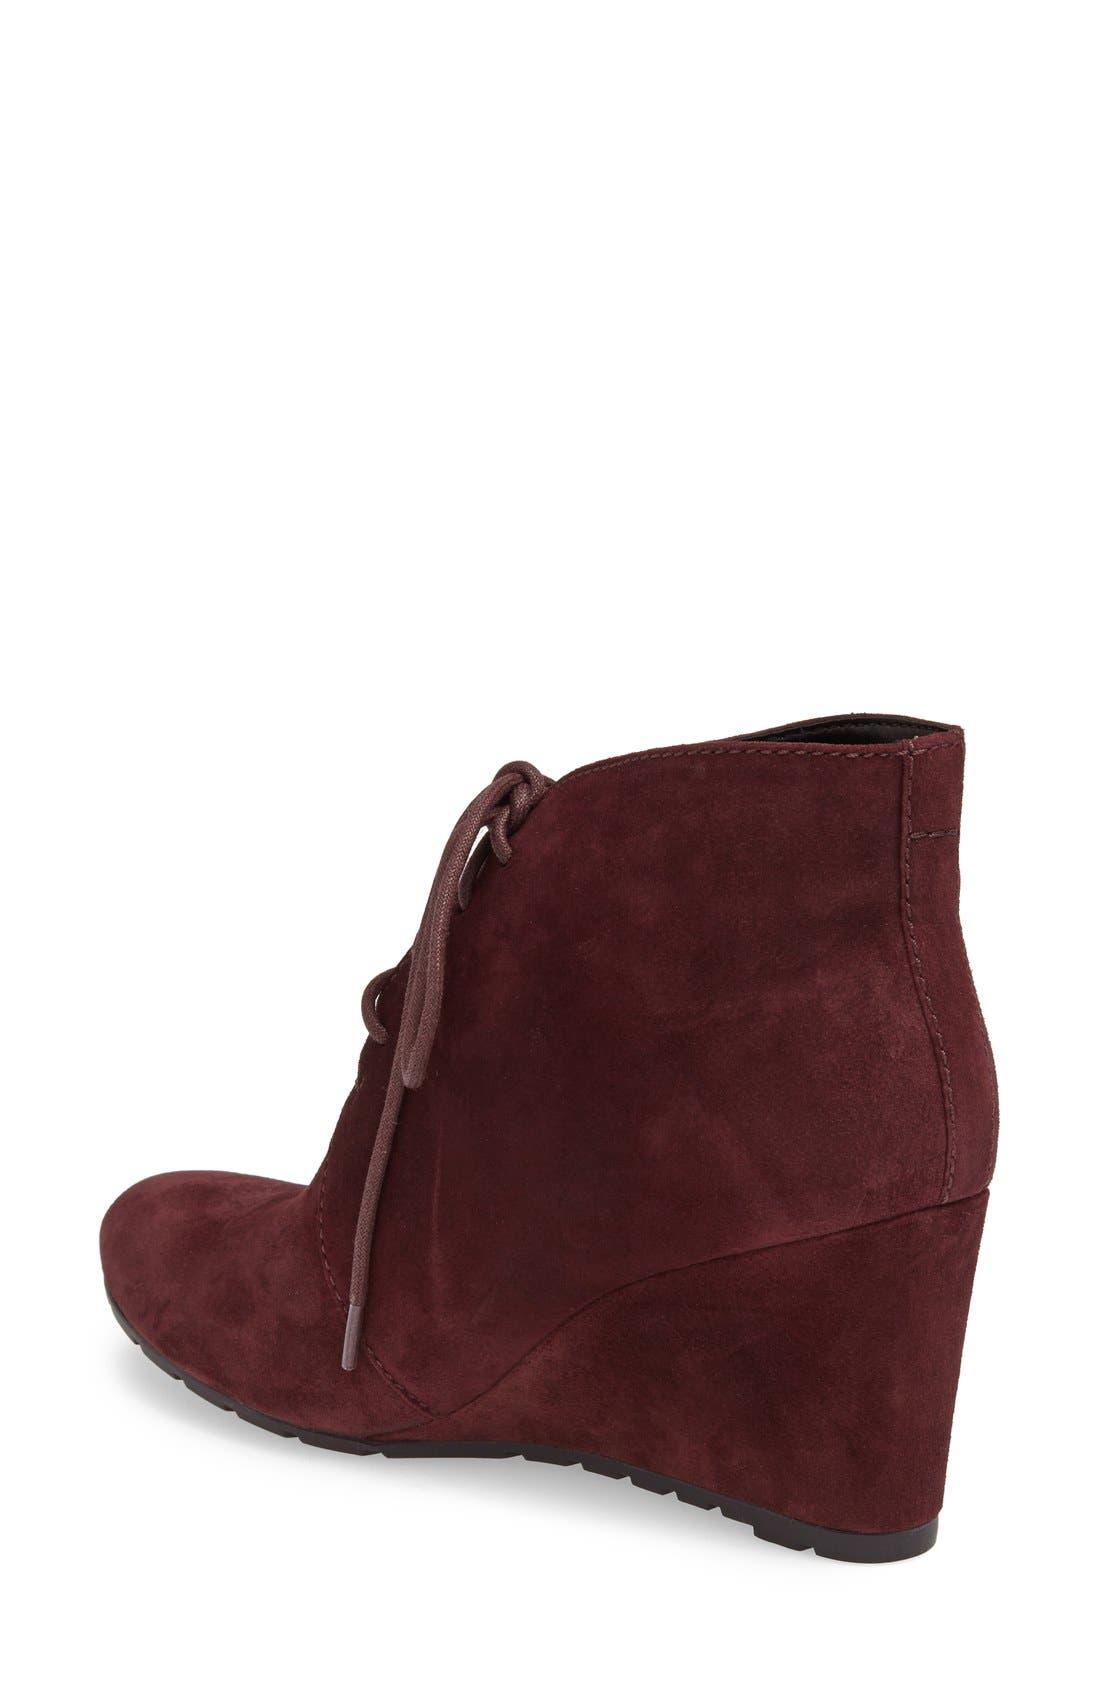 Alternate Image 2  - Clarks® 'Rosepoint Dew' Suede Boot (Women)